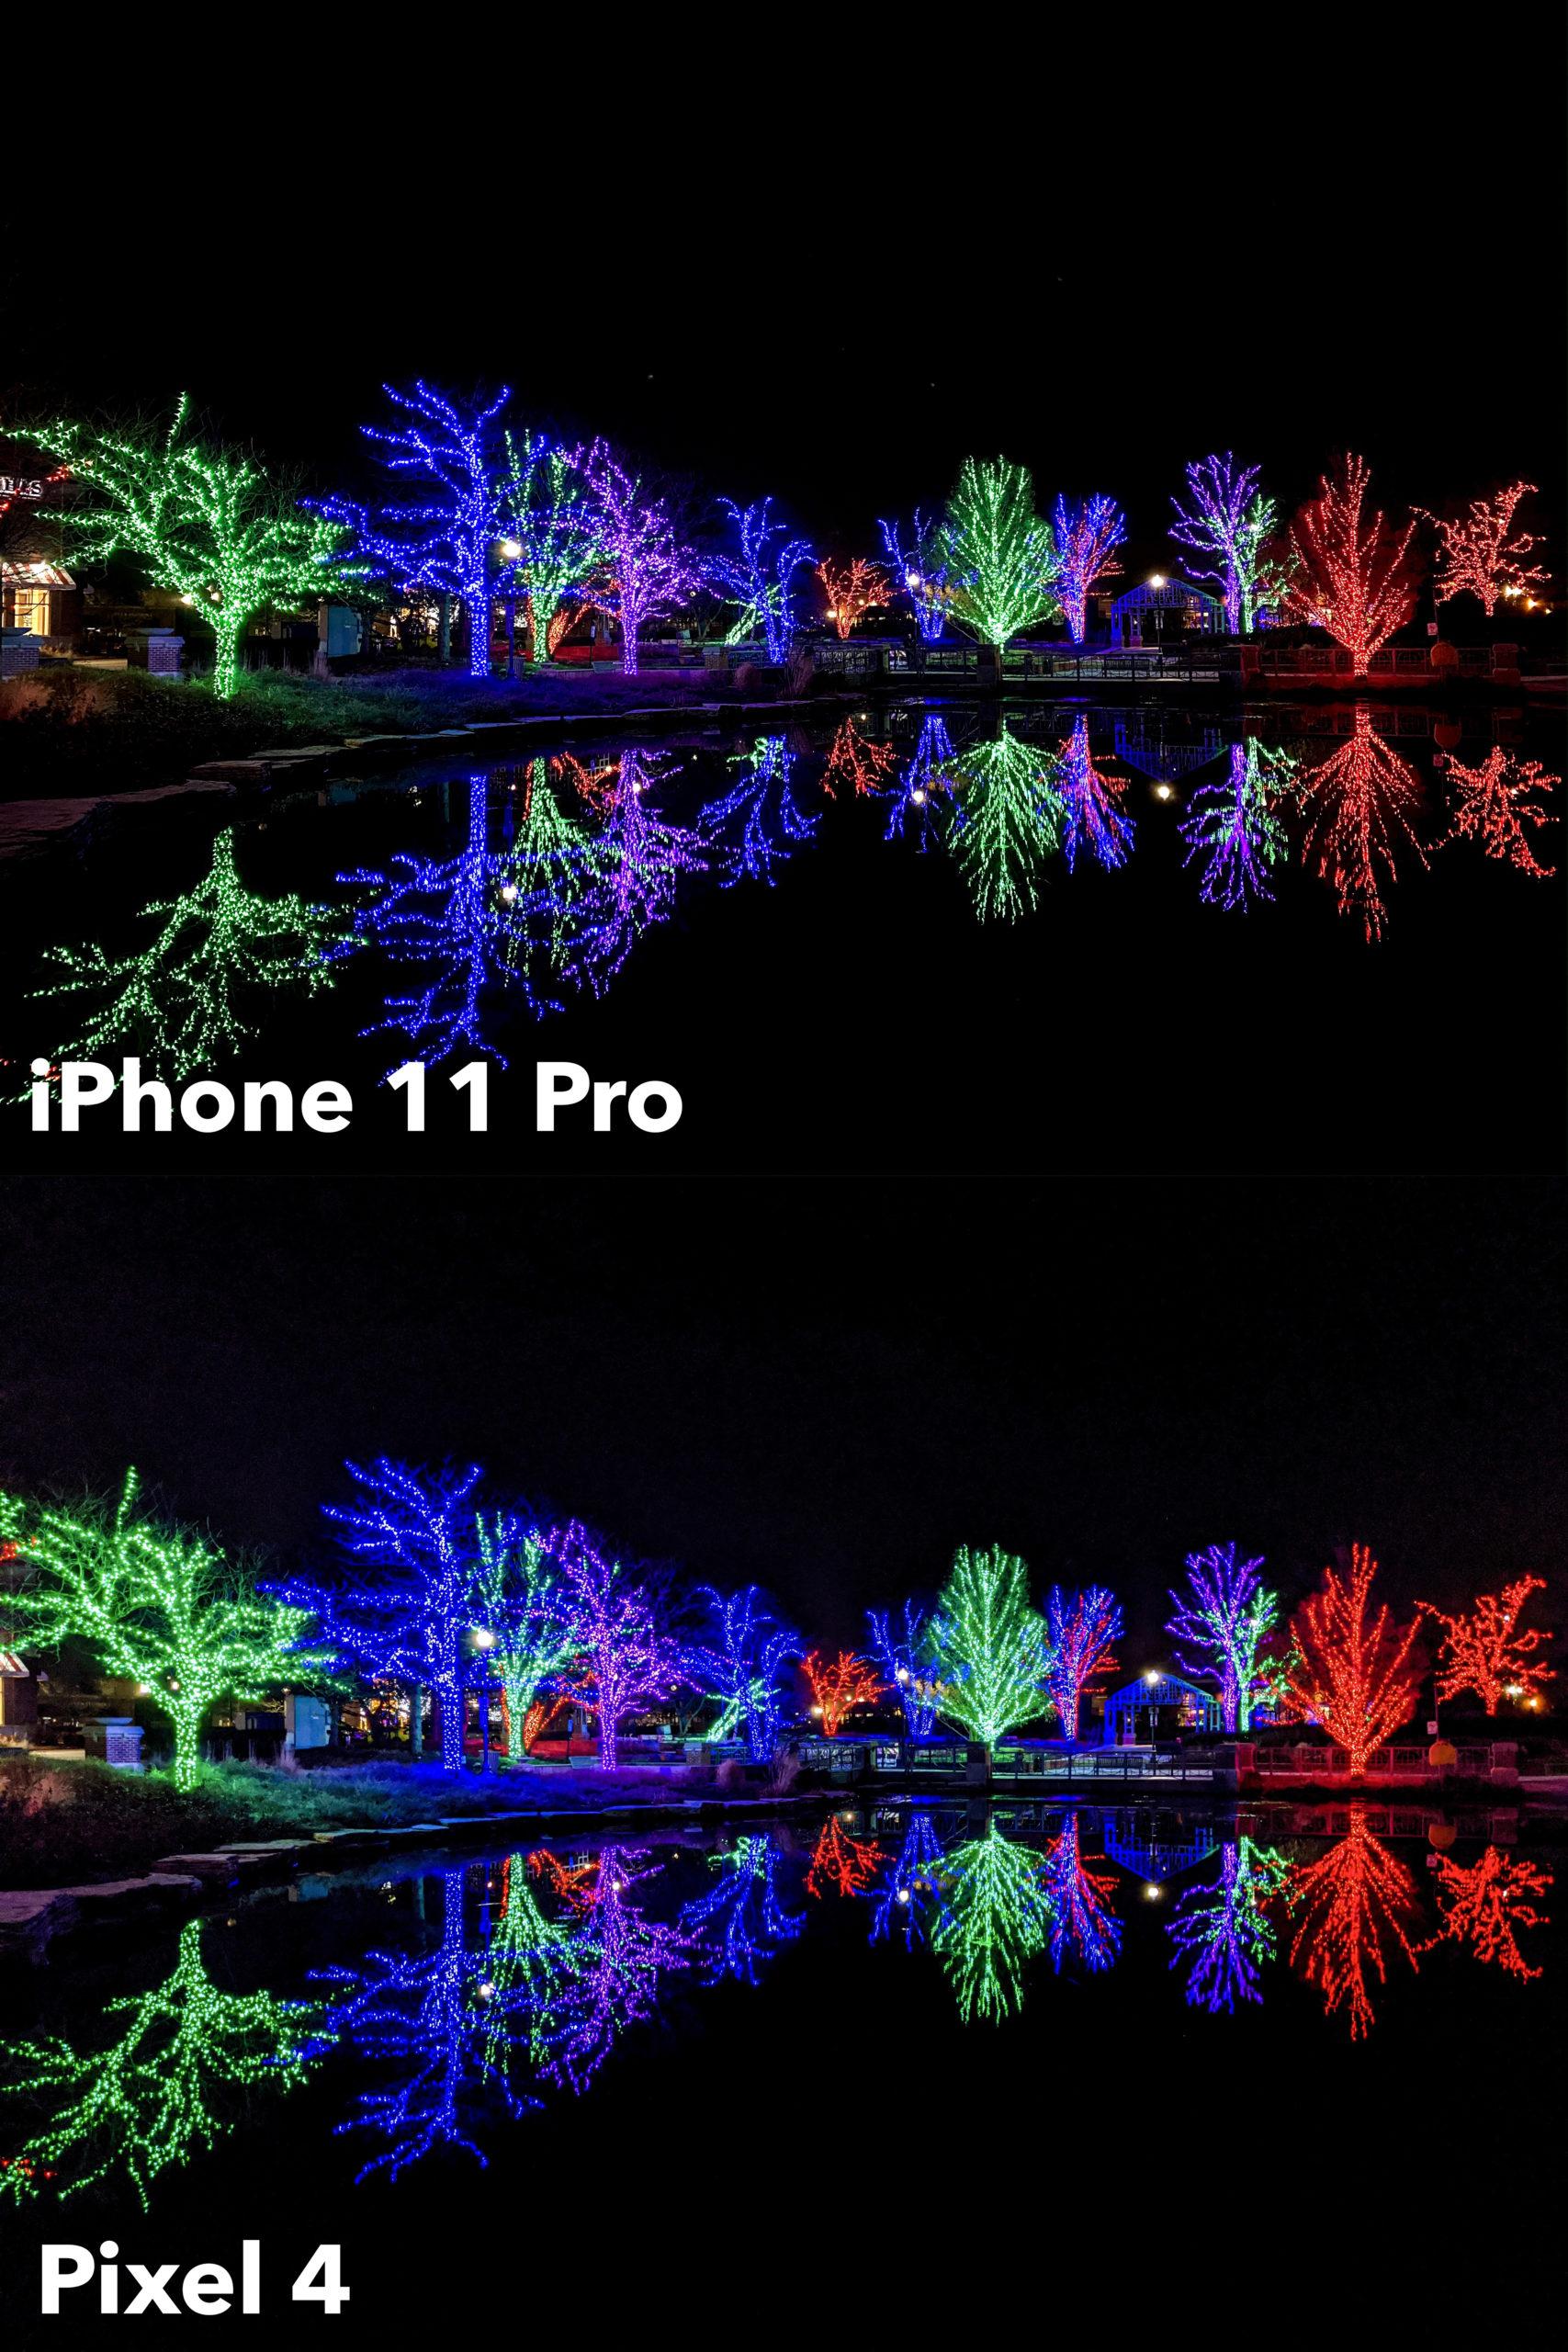 Camera Birchtree